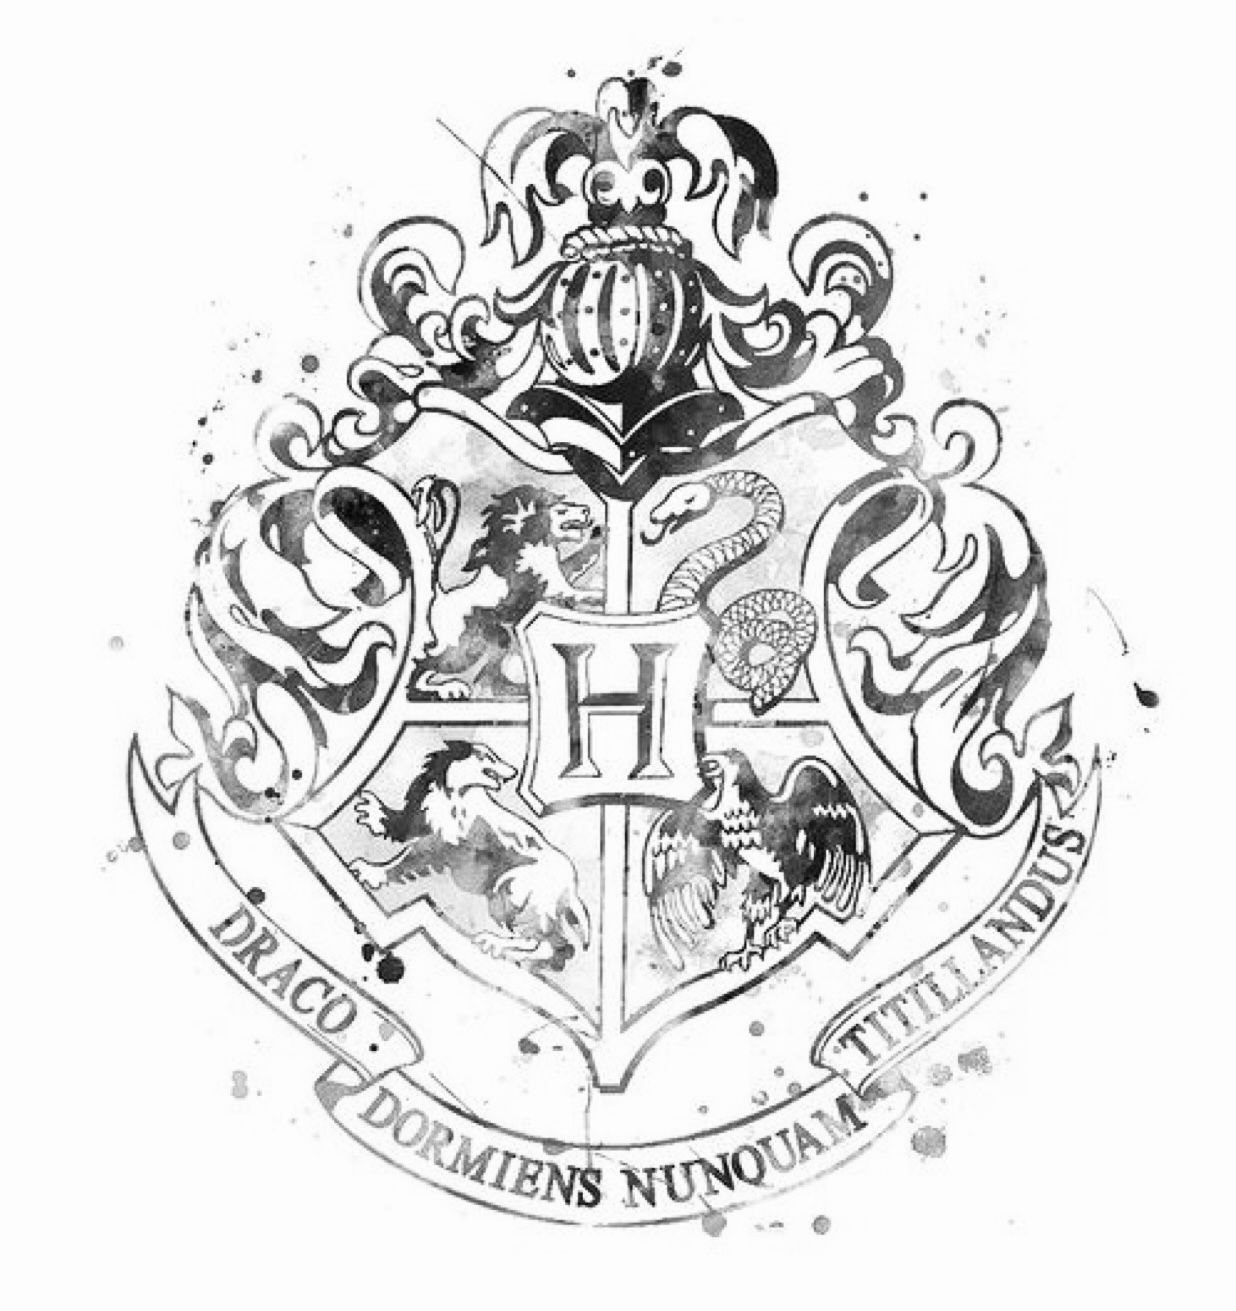 Harry Potter Black And White Aesthetic Harry Potter Tattoos Harry Potter Bildschirmhintergrund Harry Potter Zeichen